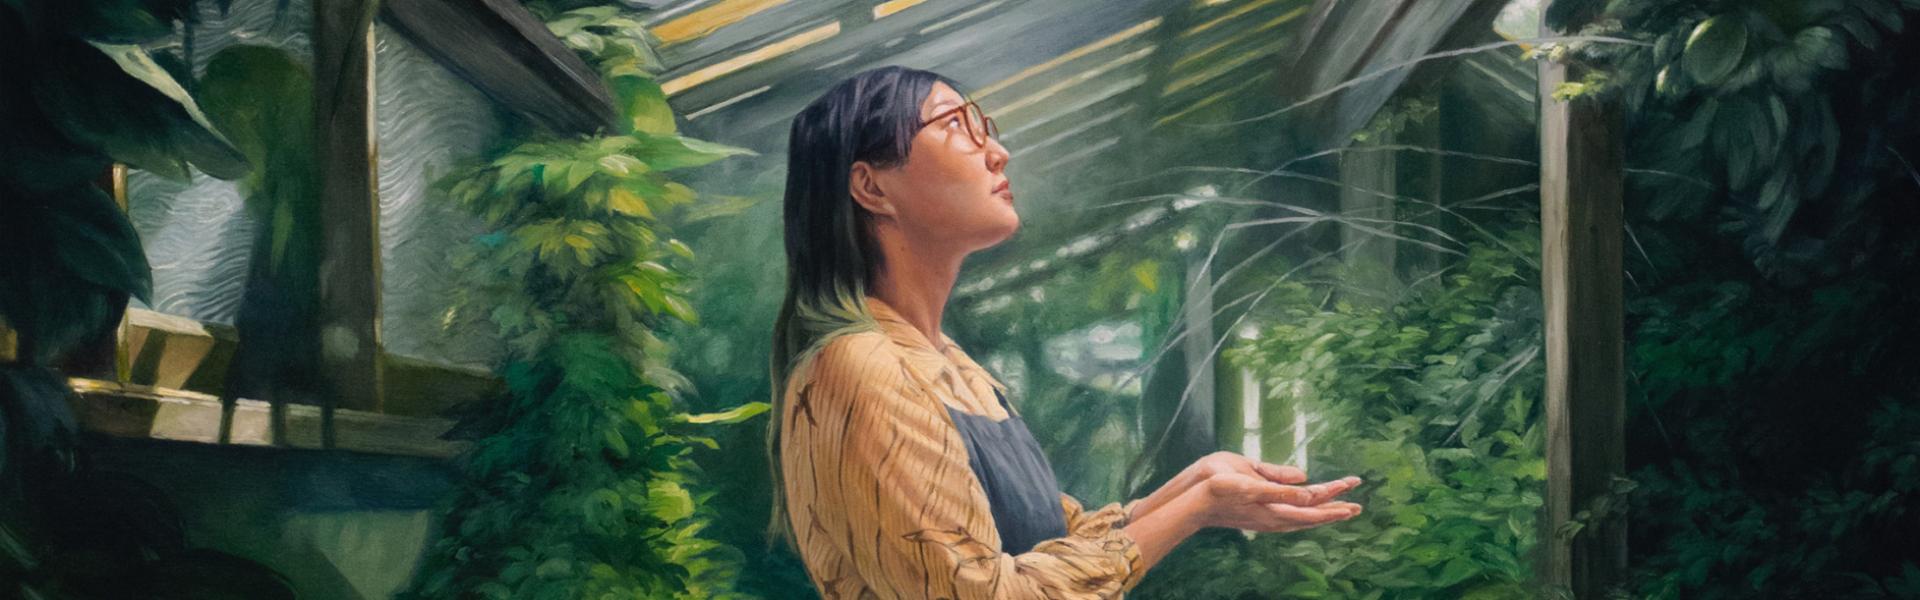 banner_the-greenhouse-banner.20210517004611.jpg